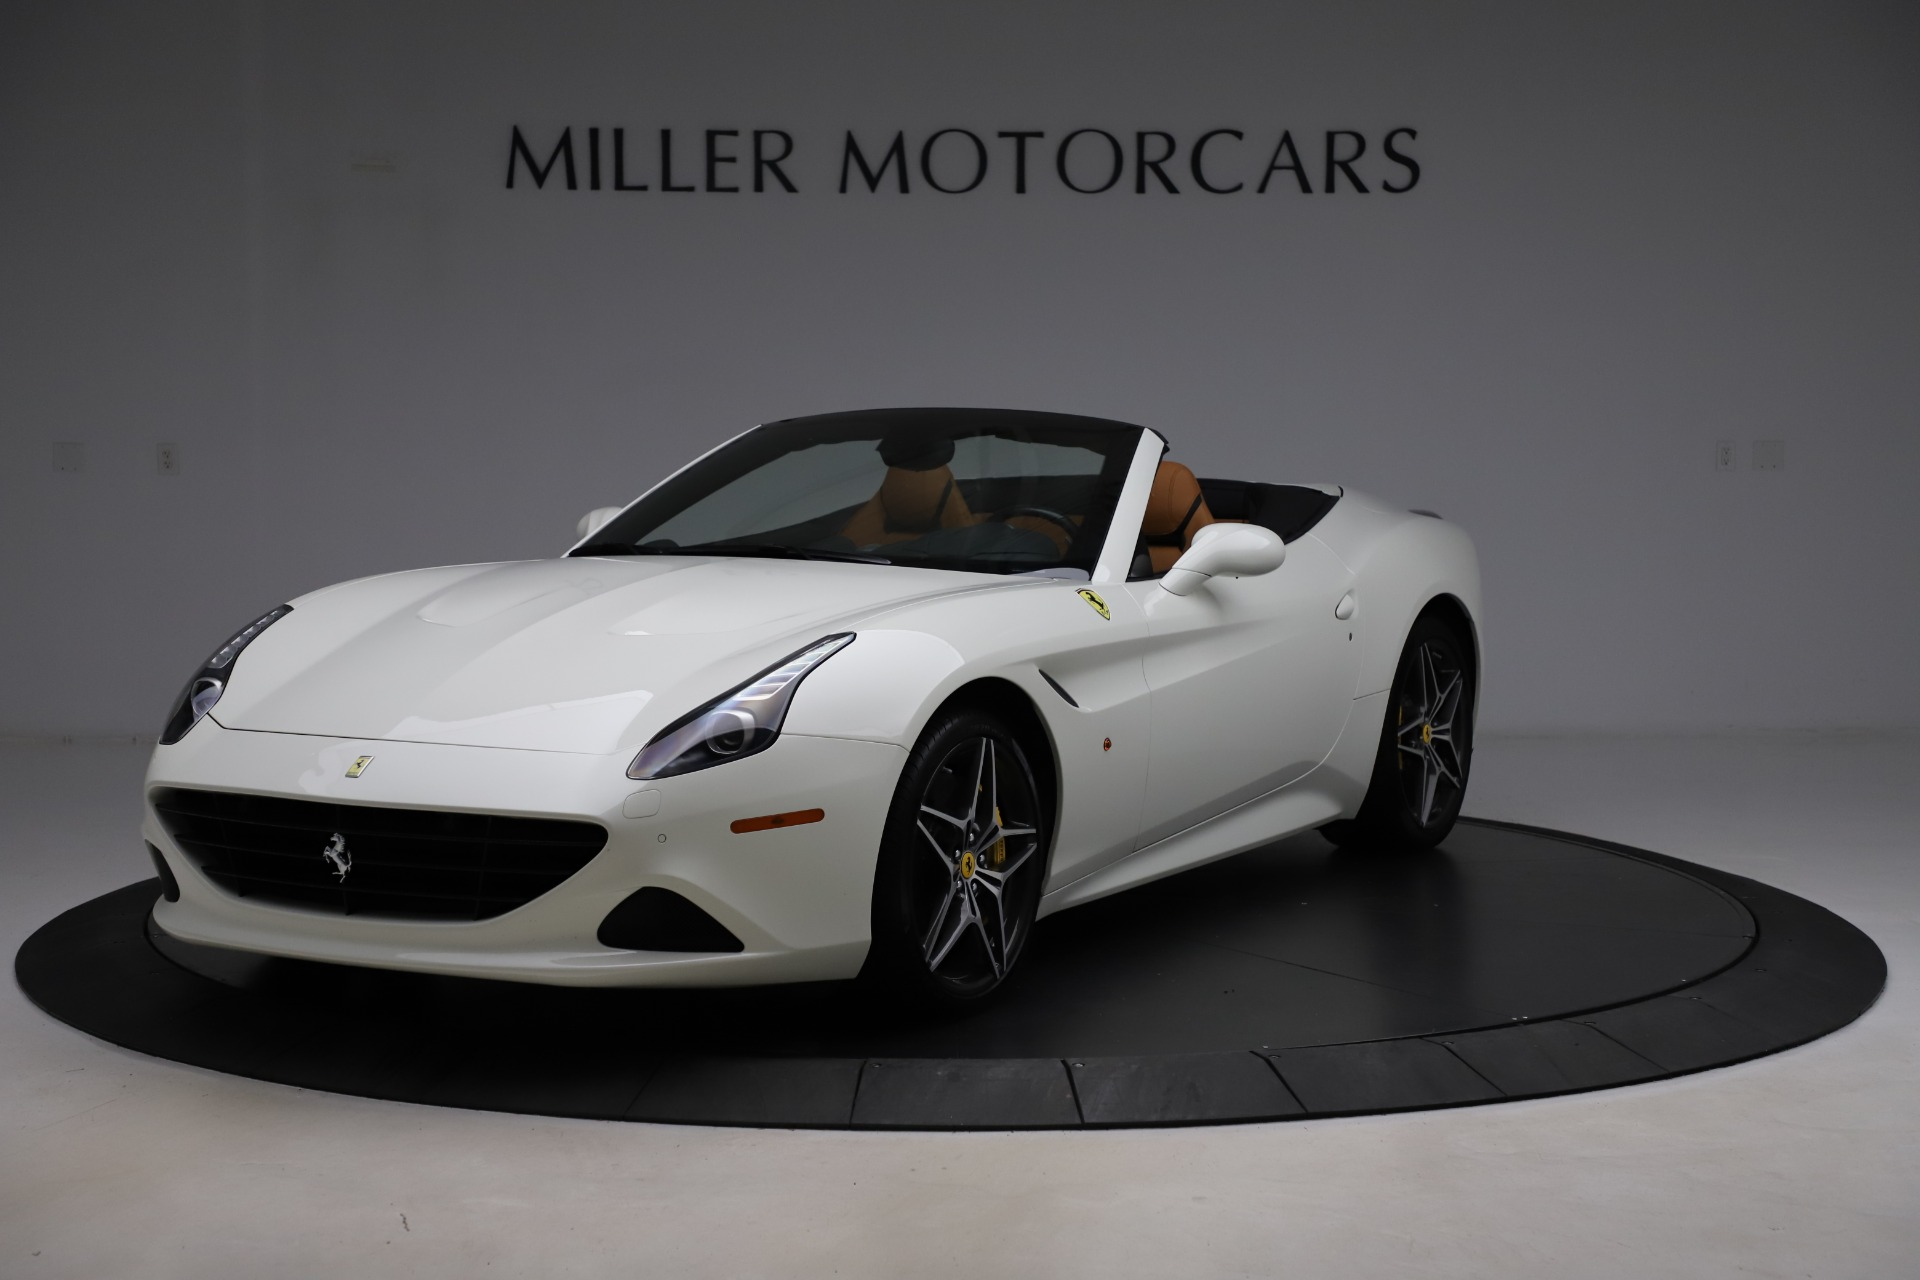 Used 2018 Ferrari California T for sale $169,900 at Rolls-Royce Motor Cars Greenwich in Greenwich CT 06830 1